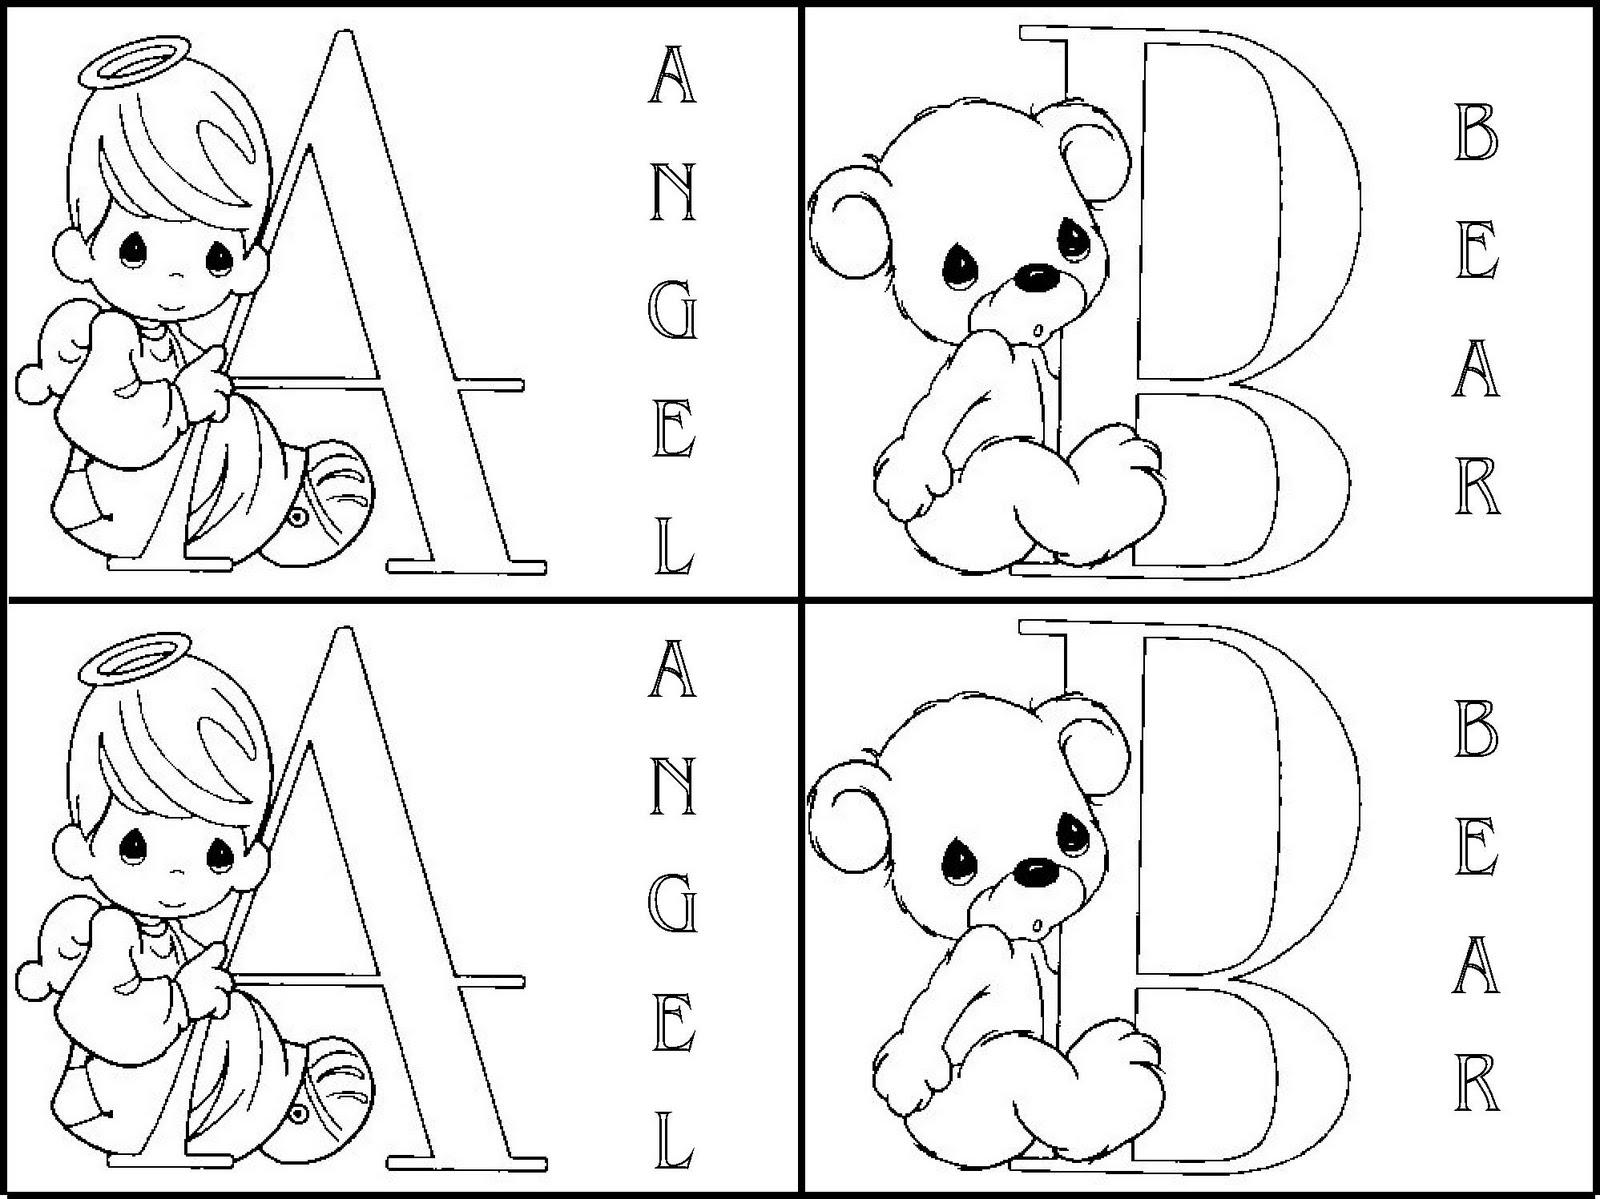 RobbyGurls Creations Everything Kids